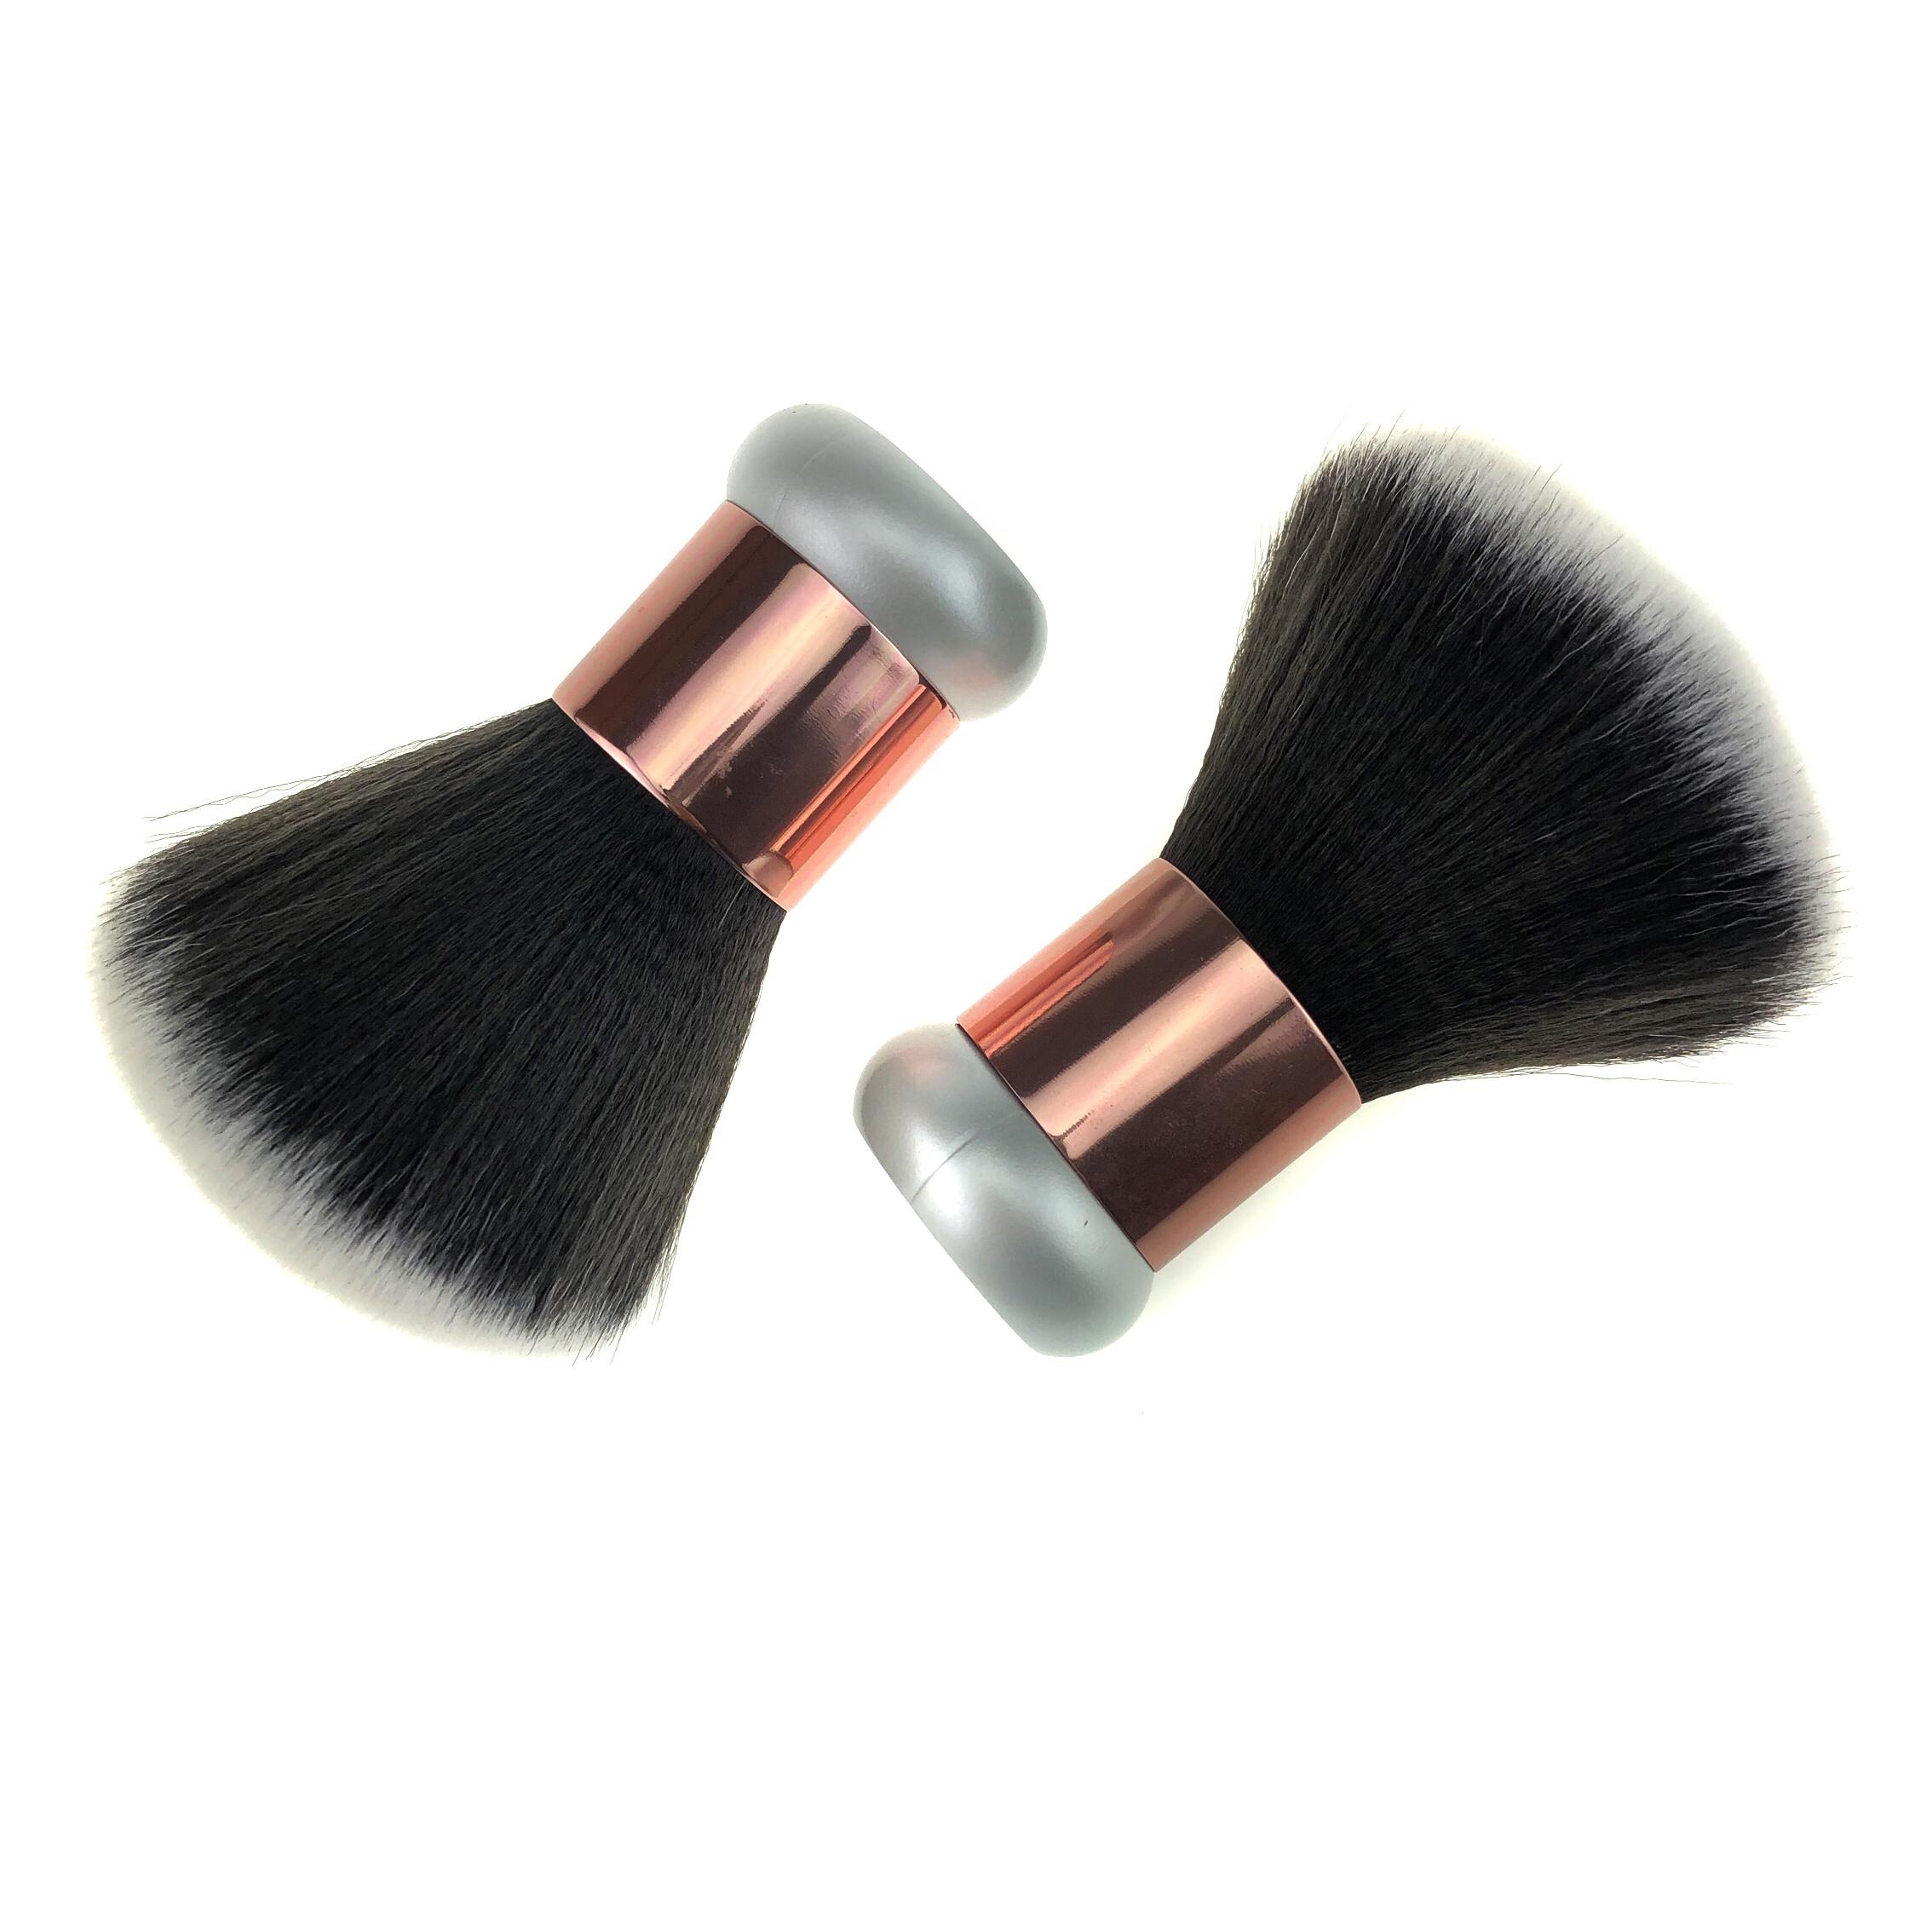 Fluffy high quality synthetic hair makeup pro rose gold kabuki brush